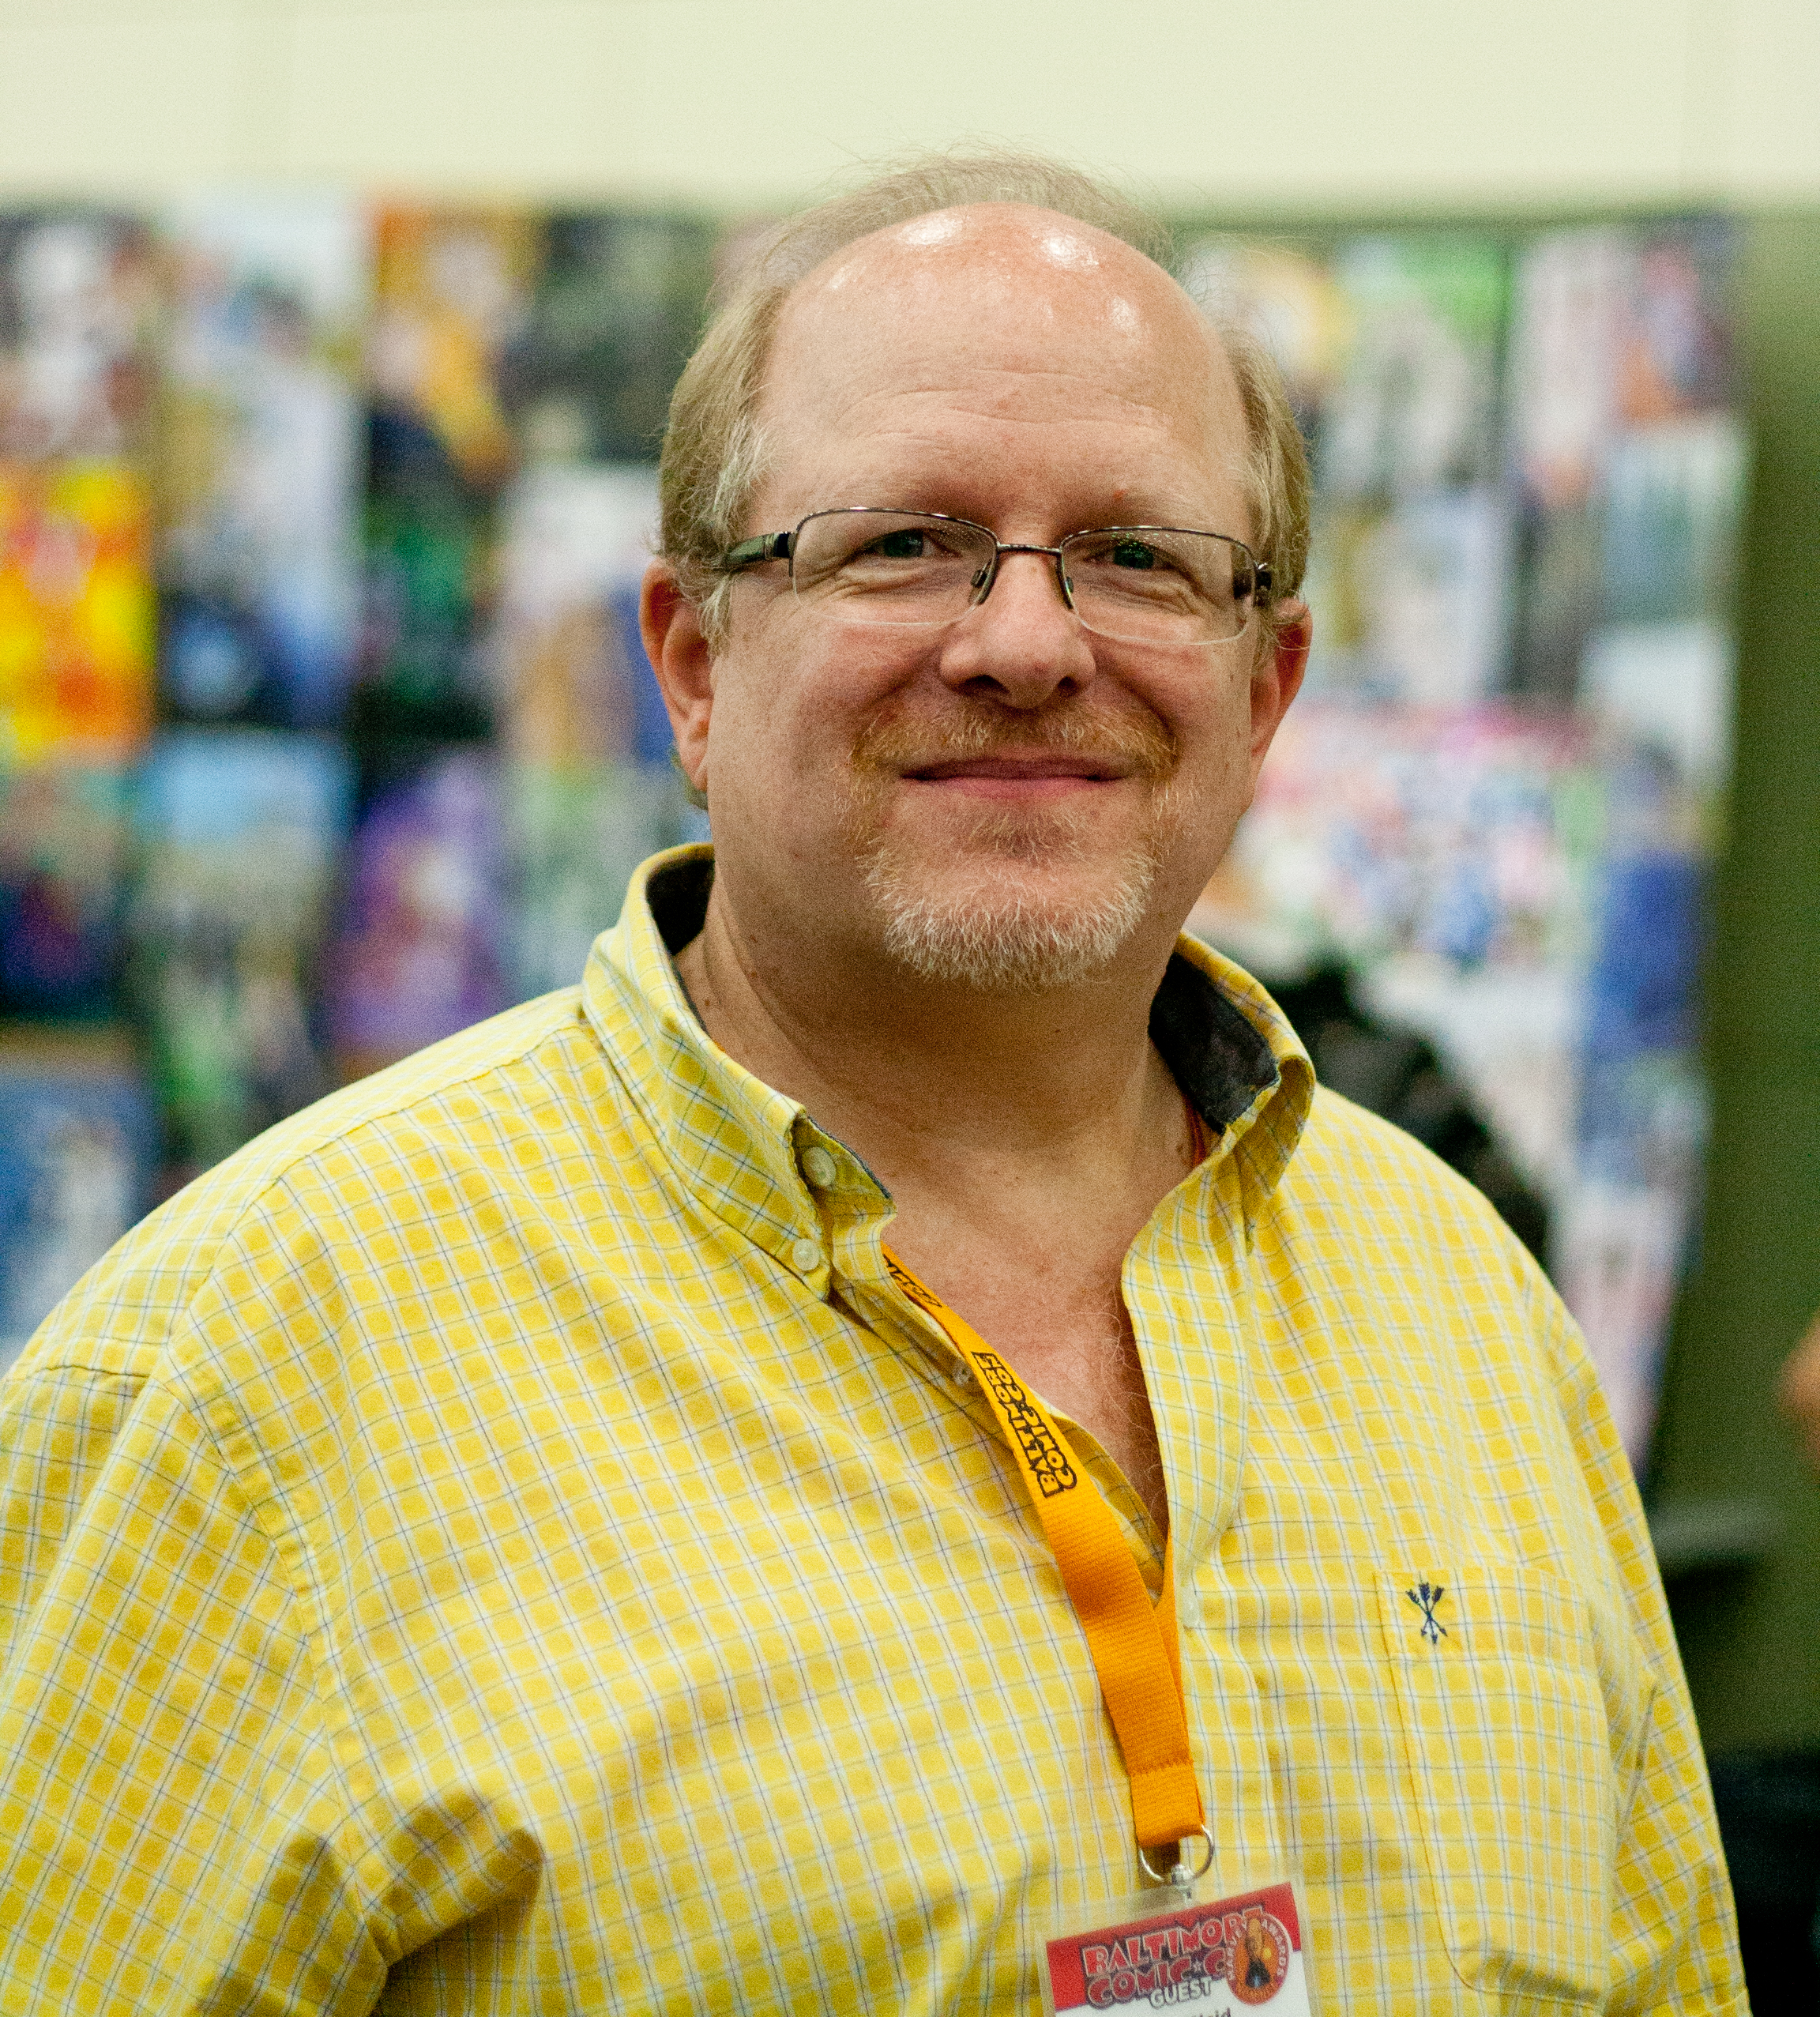 Mark Waid at Baltimore Comic-Con 2014